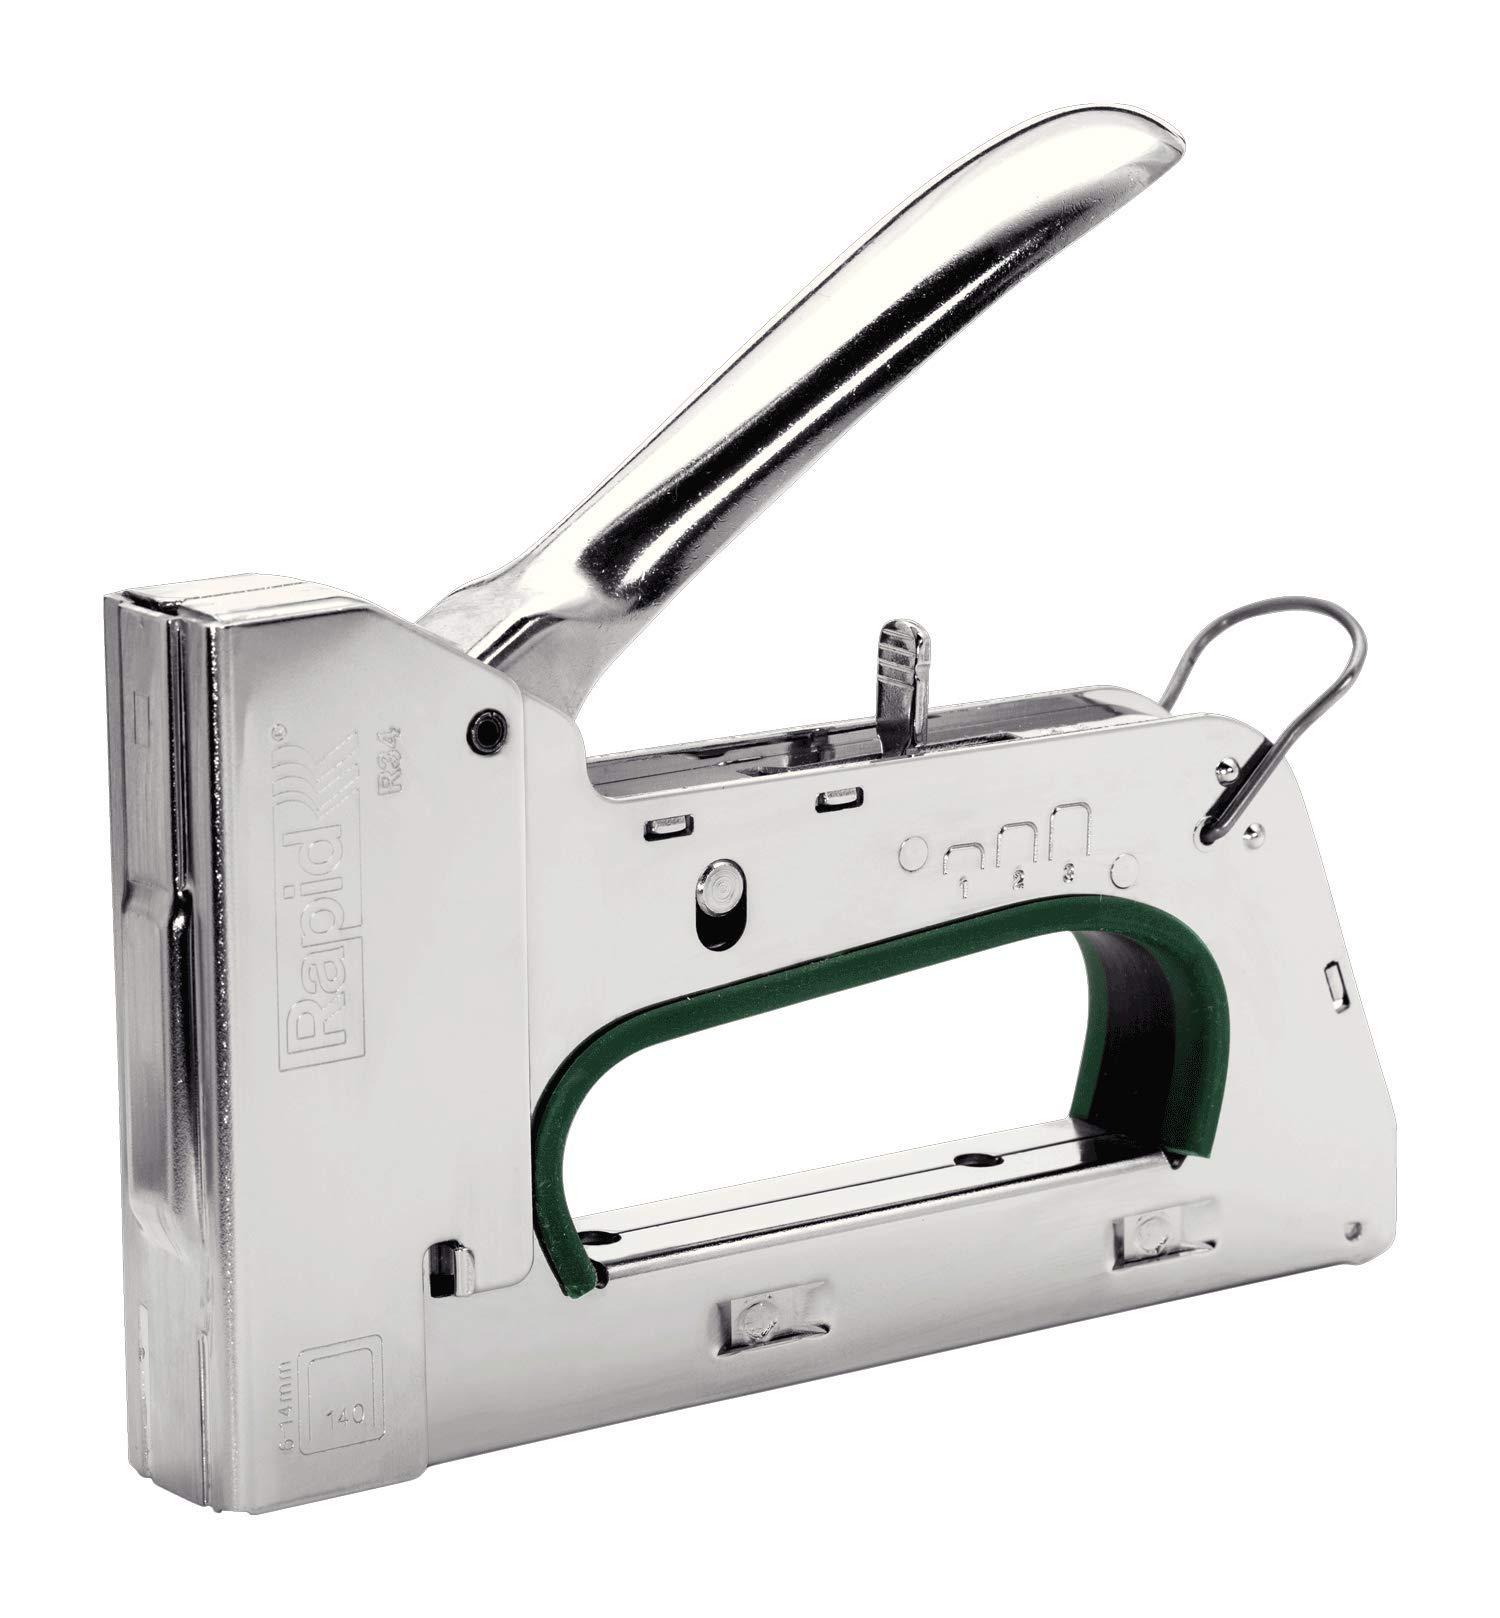 Rapid 20511550 R34 Stapling Gun by Rapid (Image #1)